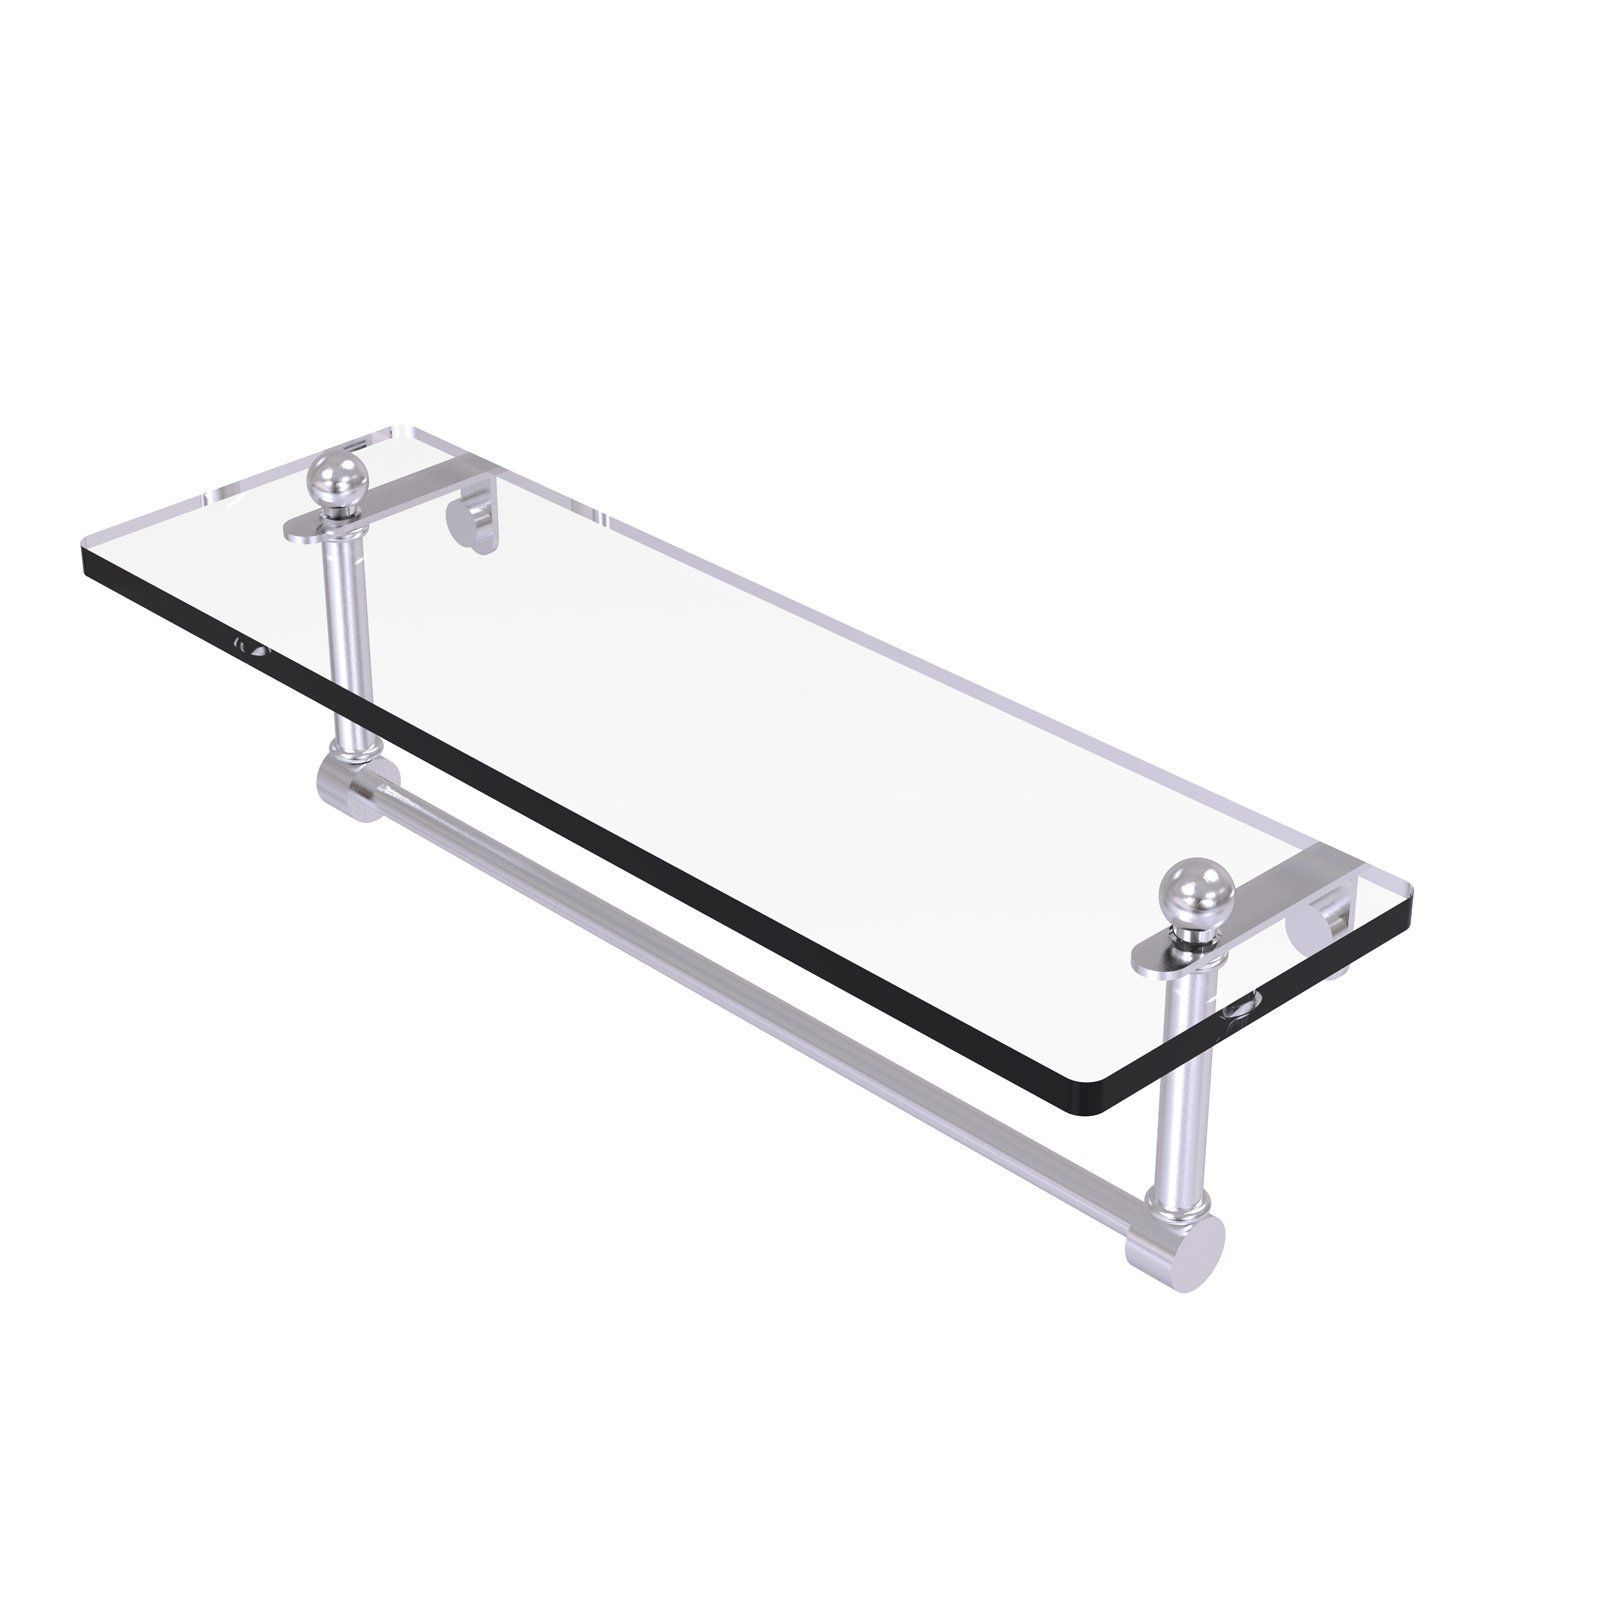 Allied brass glass vanity shelf with integrated towel bar pr